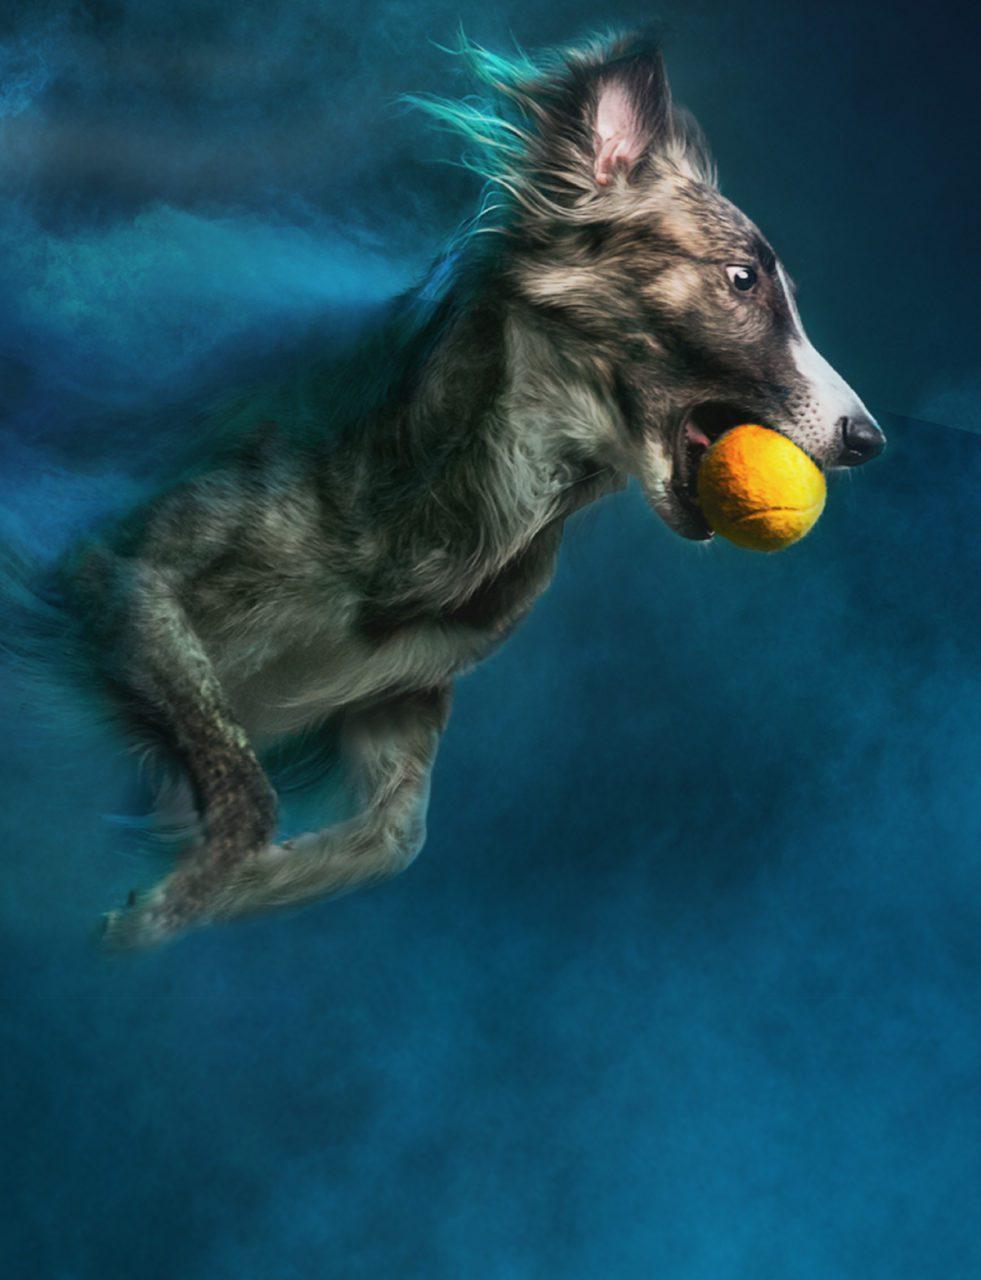 RCL - Ultra Pet | The co-watcherr Strong Dog